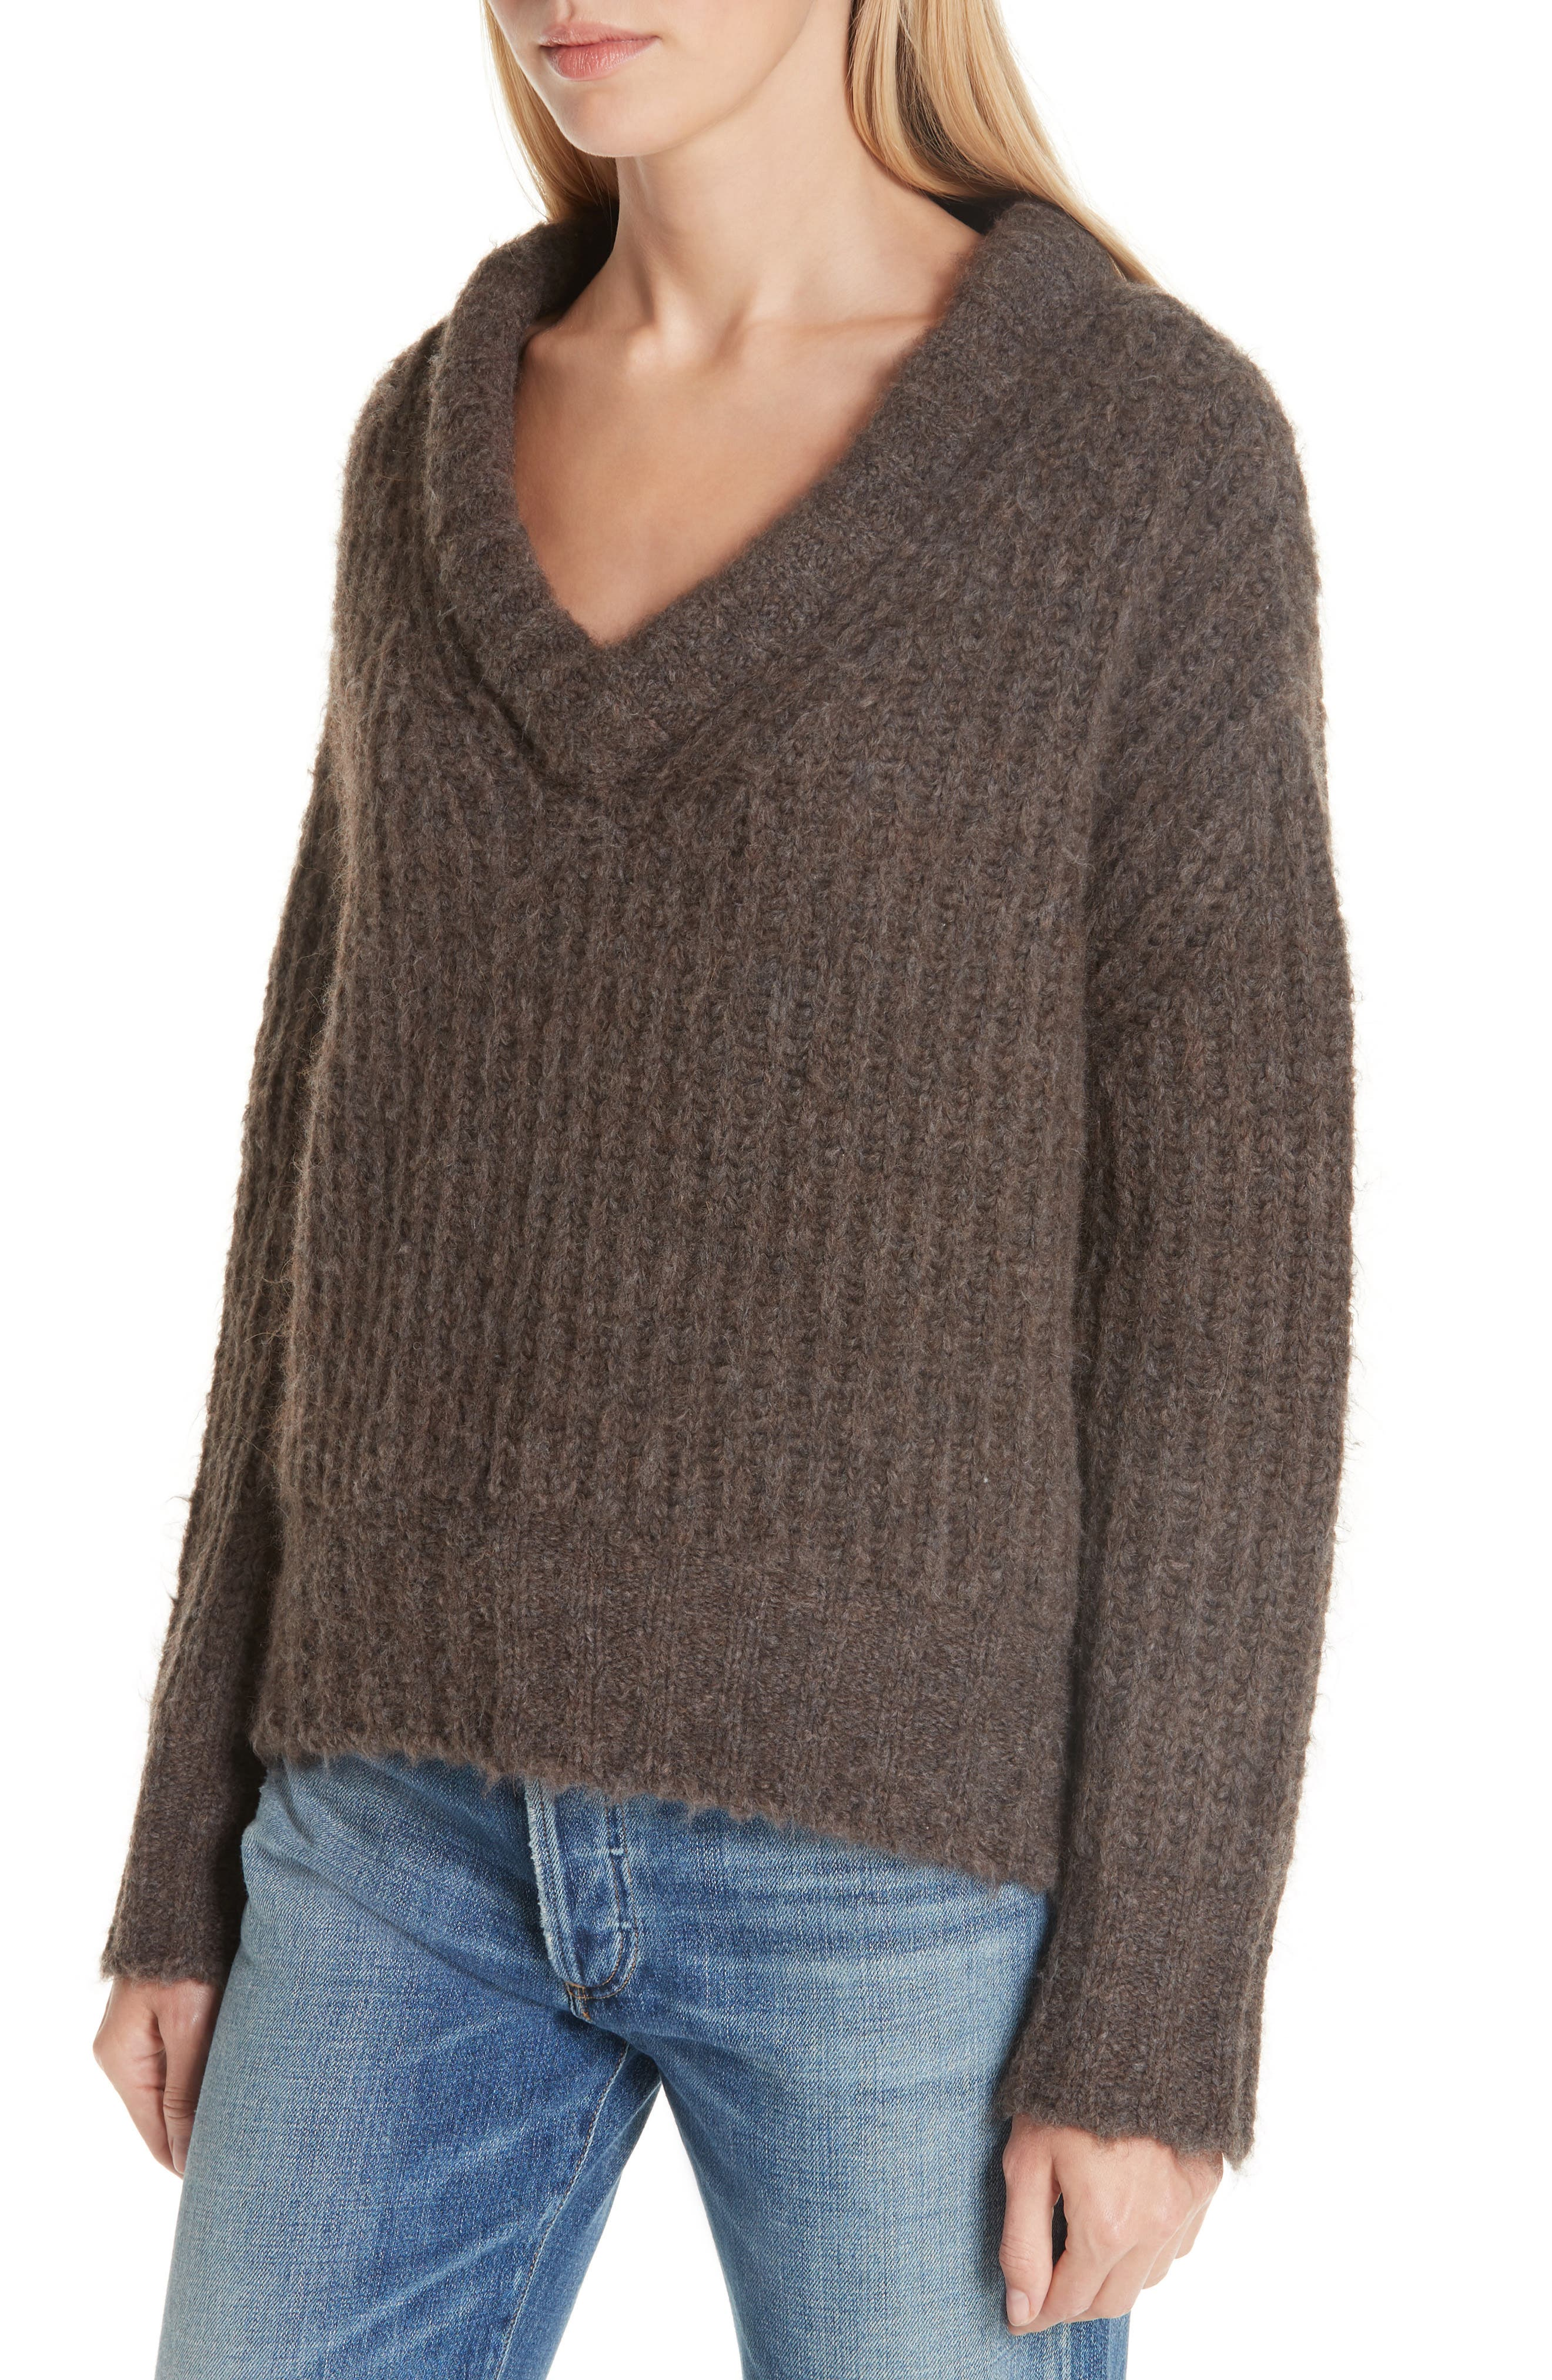 Fabiana Boxy Sweater,                             Alternate thumbnail 4, color,                             230